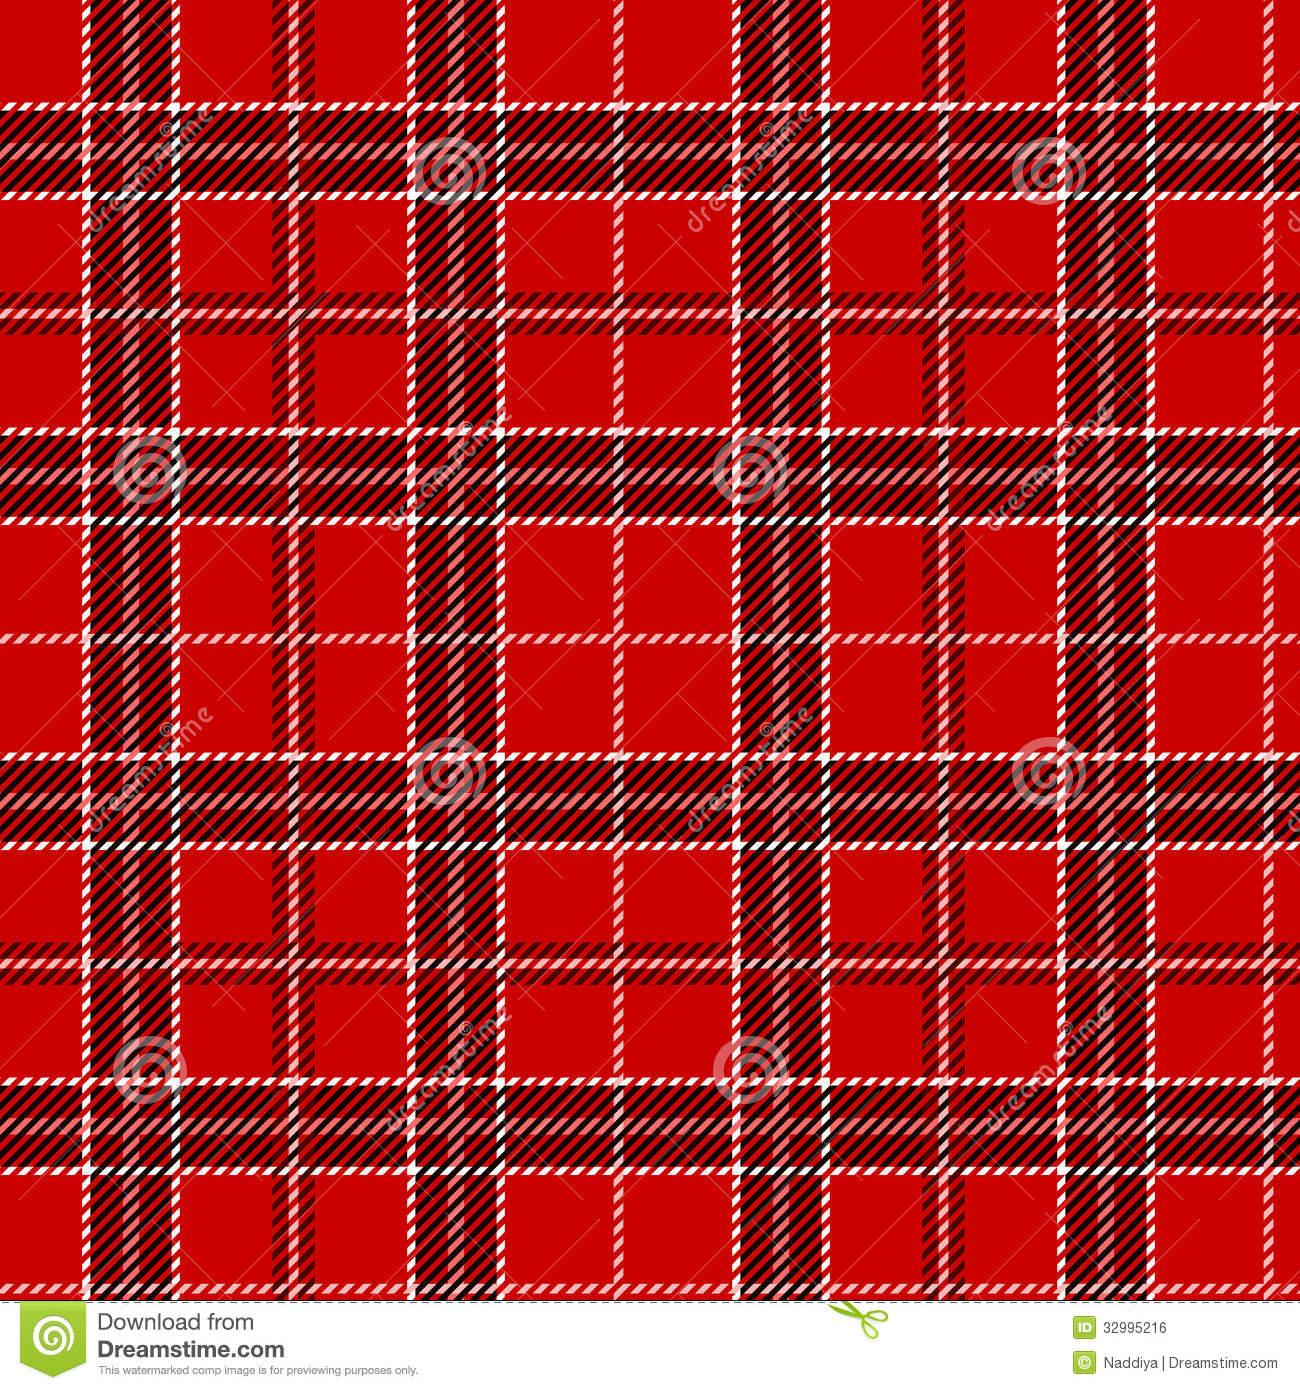 Checkered Wallpaper: Red Plaid Wallpaper